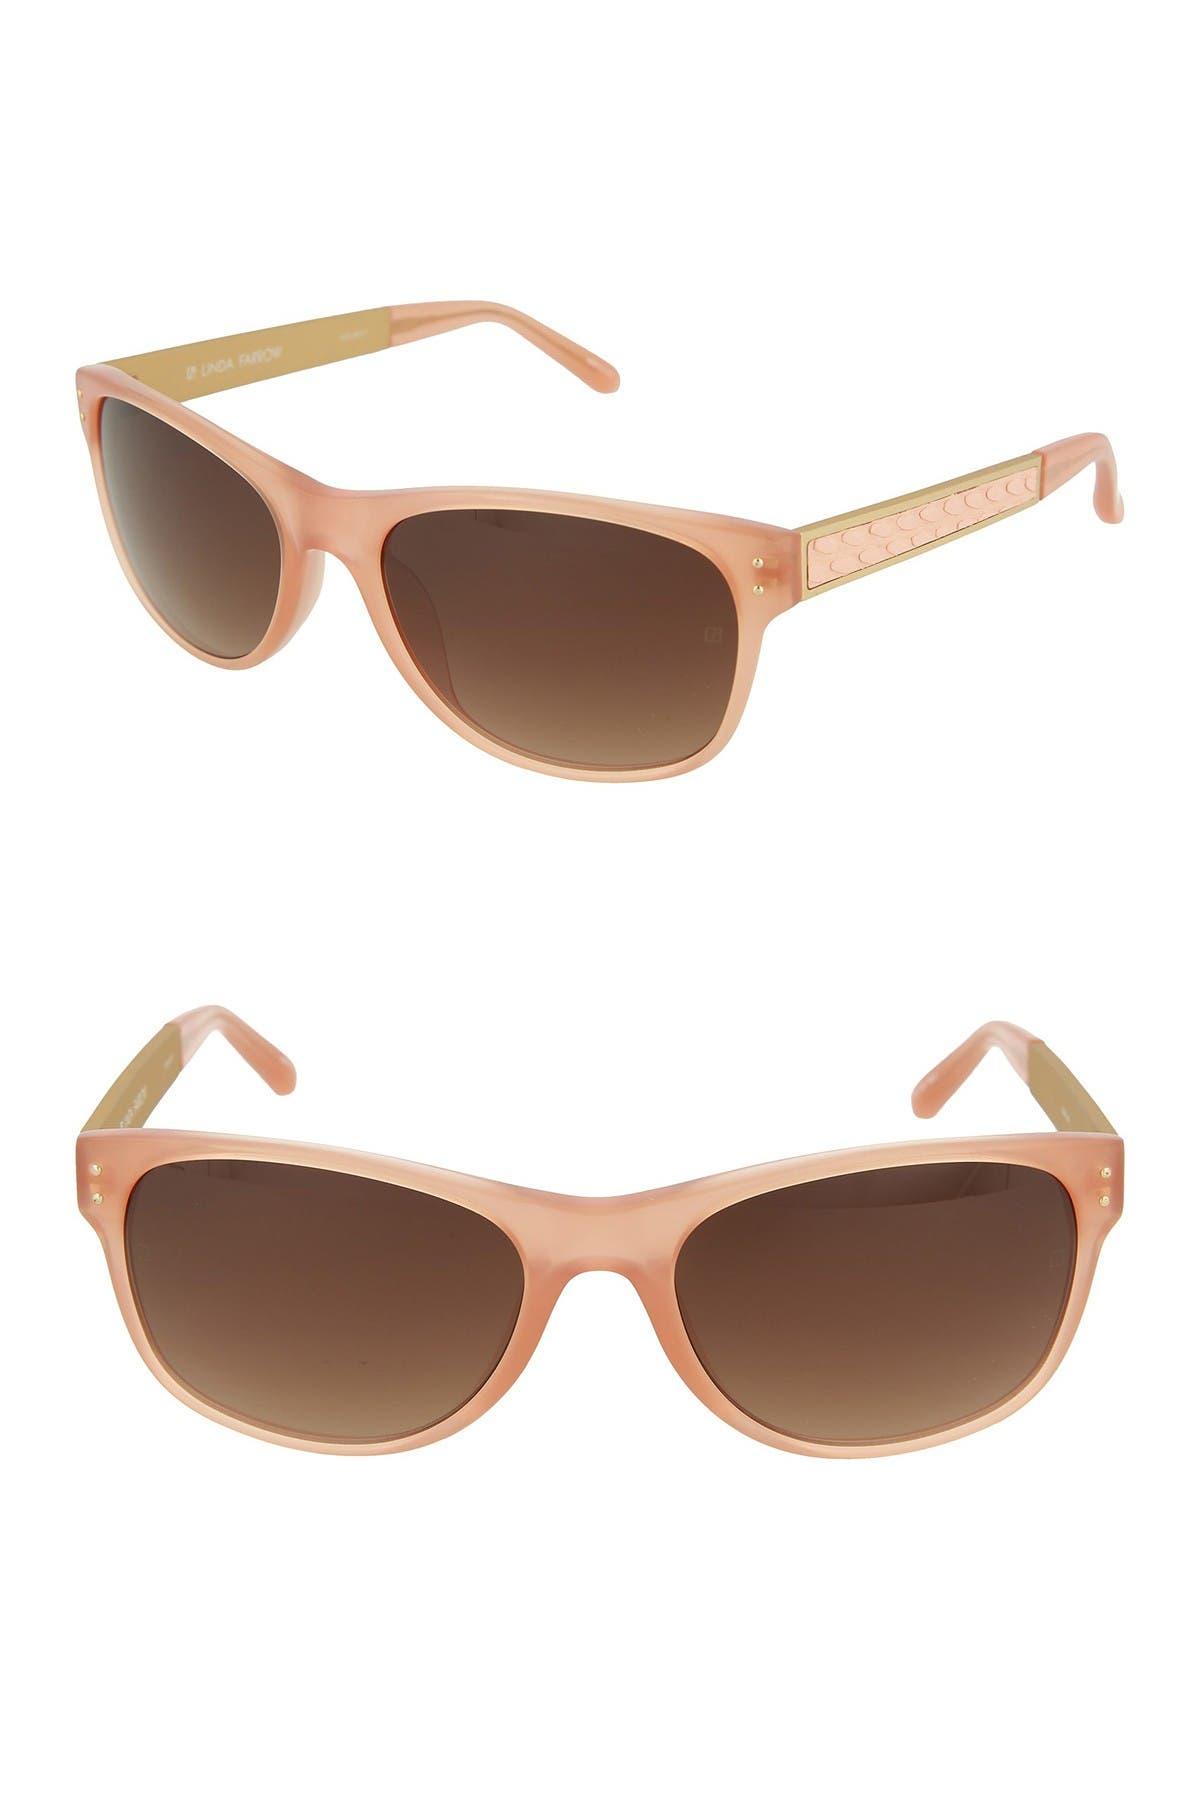 Image of Linda Farrow 55mm Oval Sunglasses